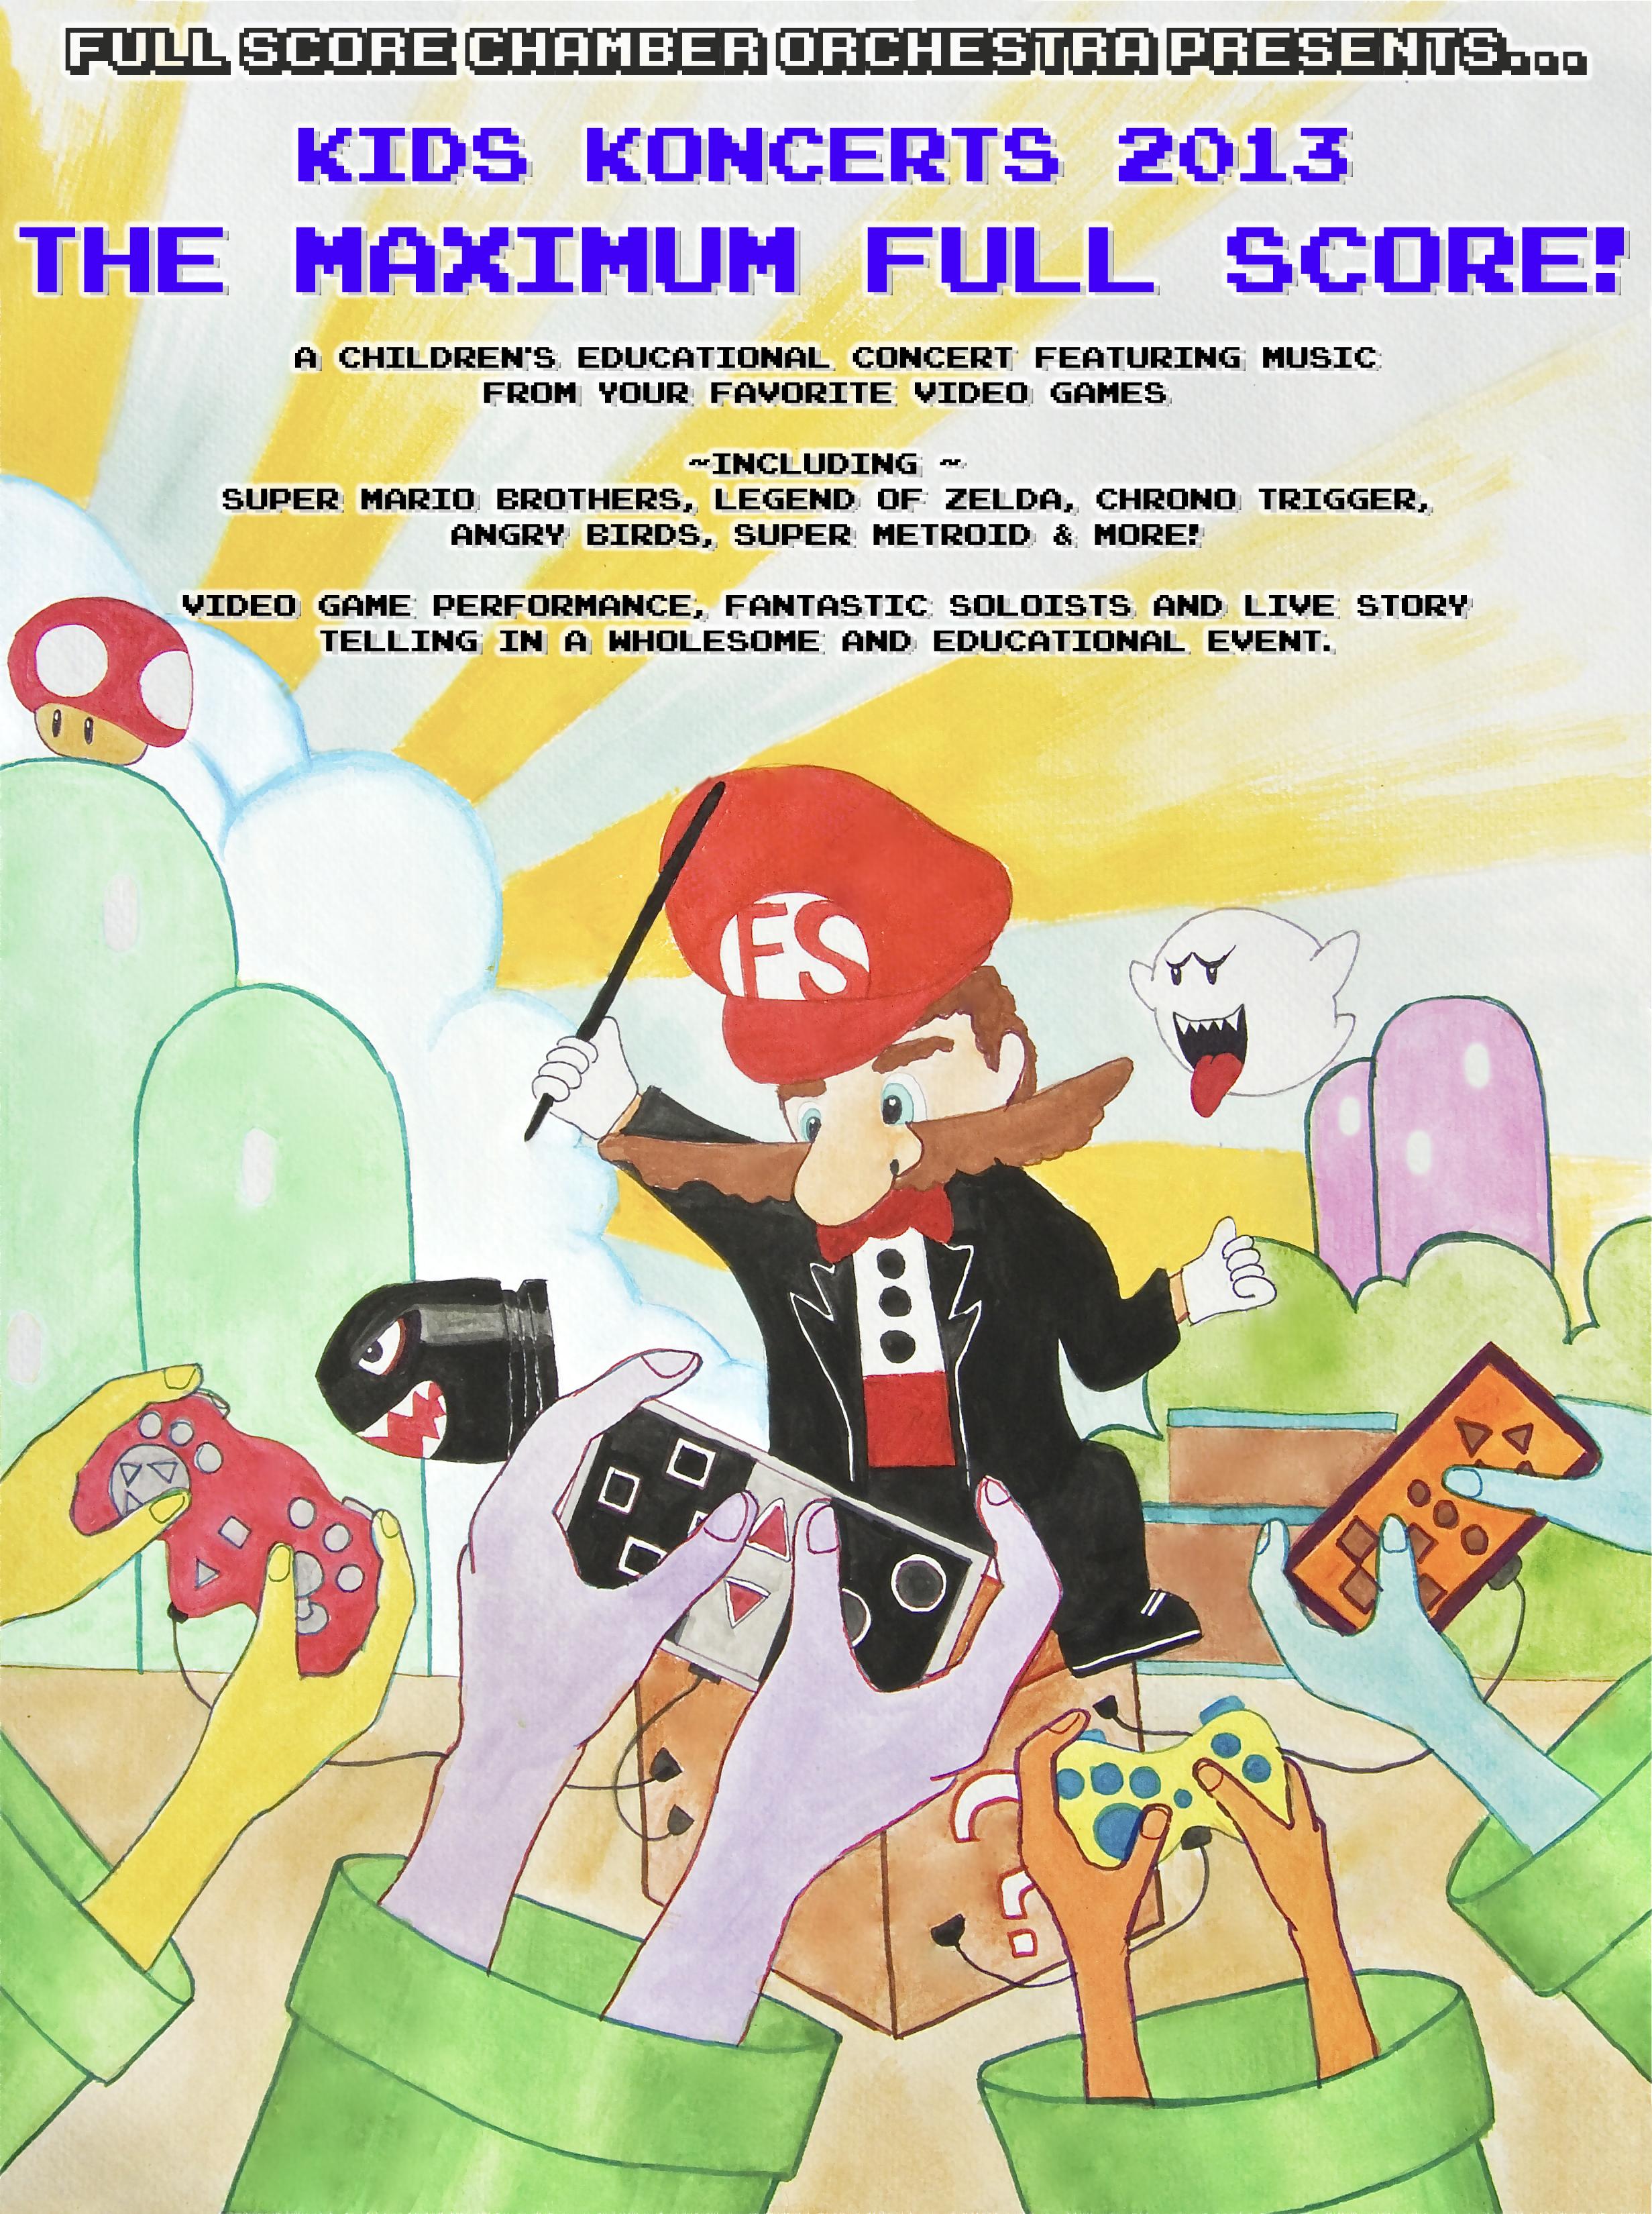 Kids Concert Poster.JPG